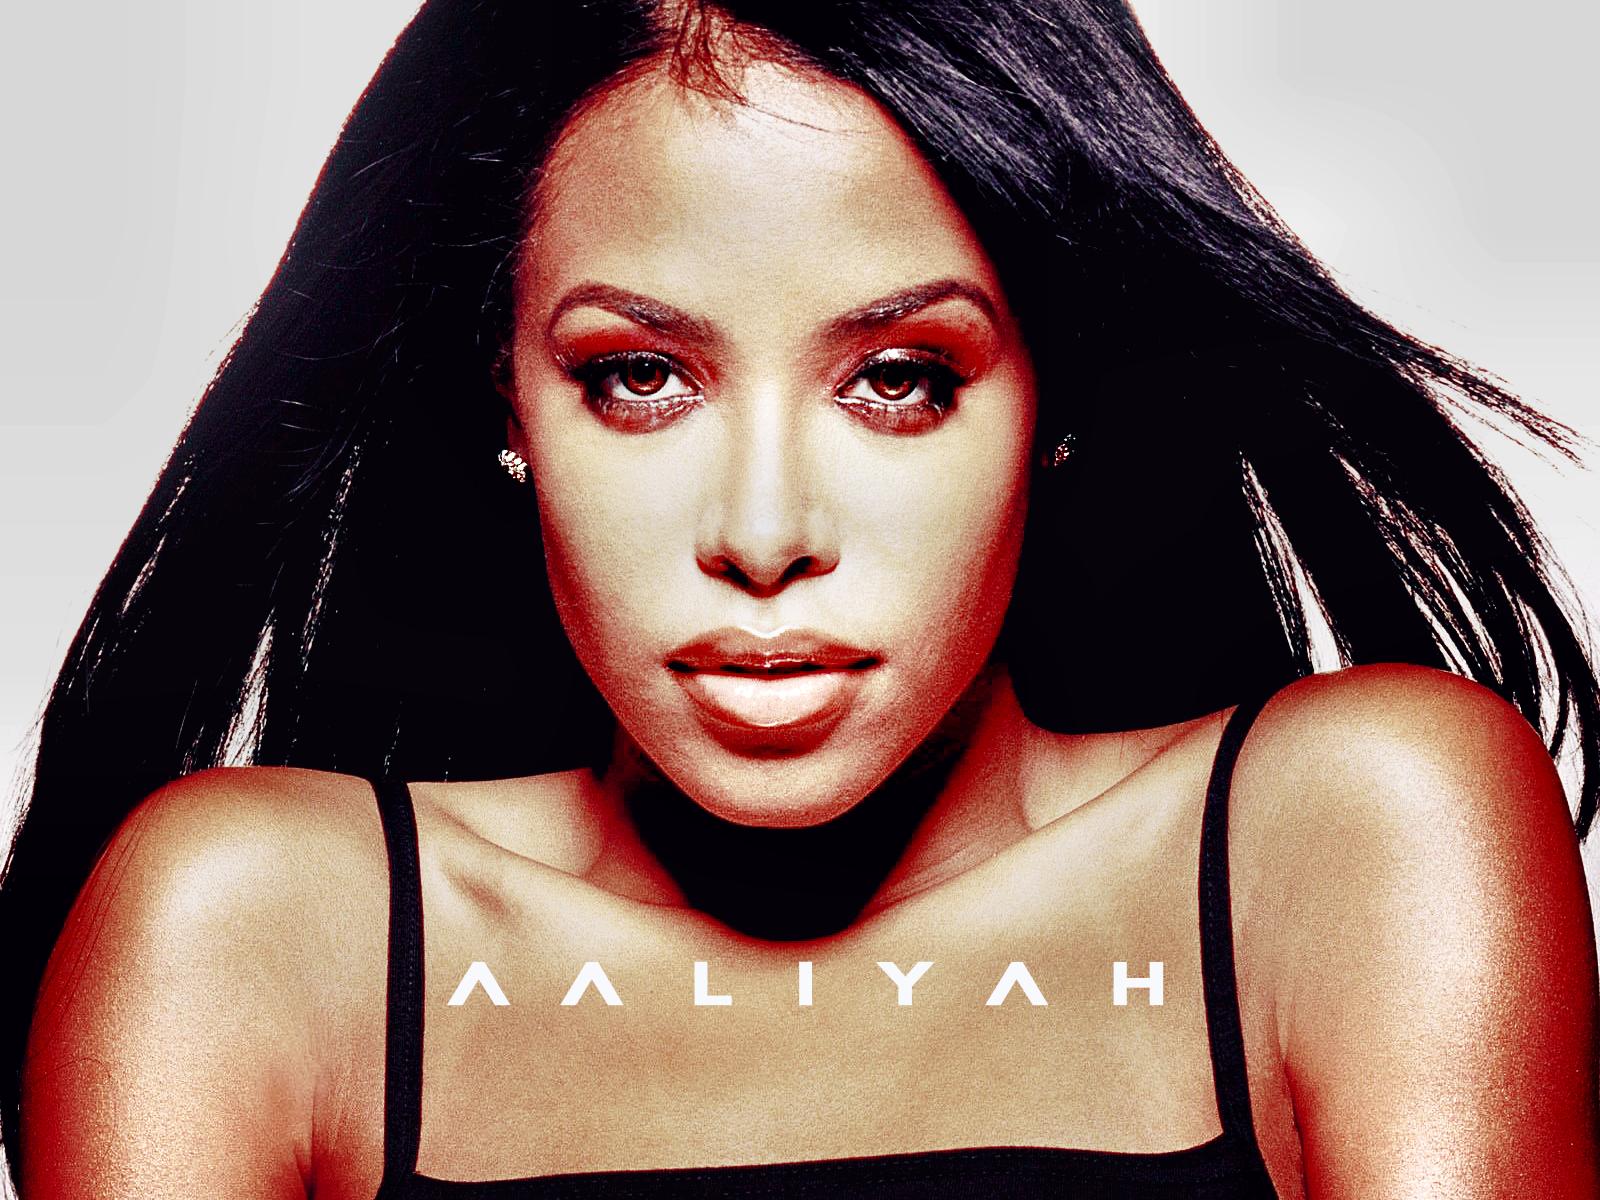 aaliyah aaliyah wallpaper 23376926 fanpop